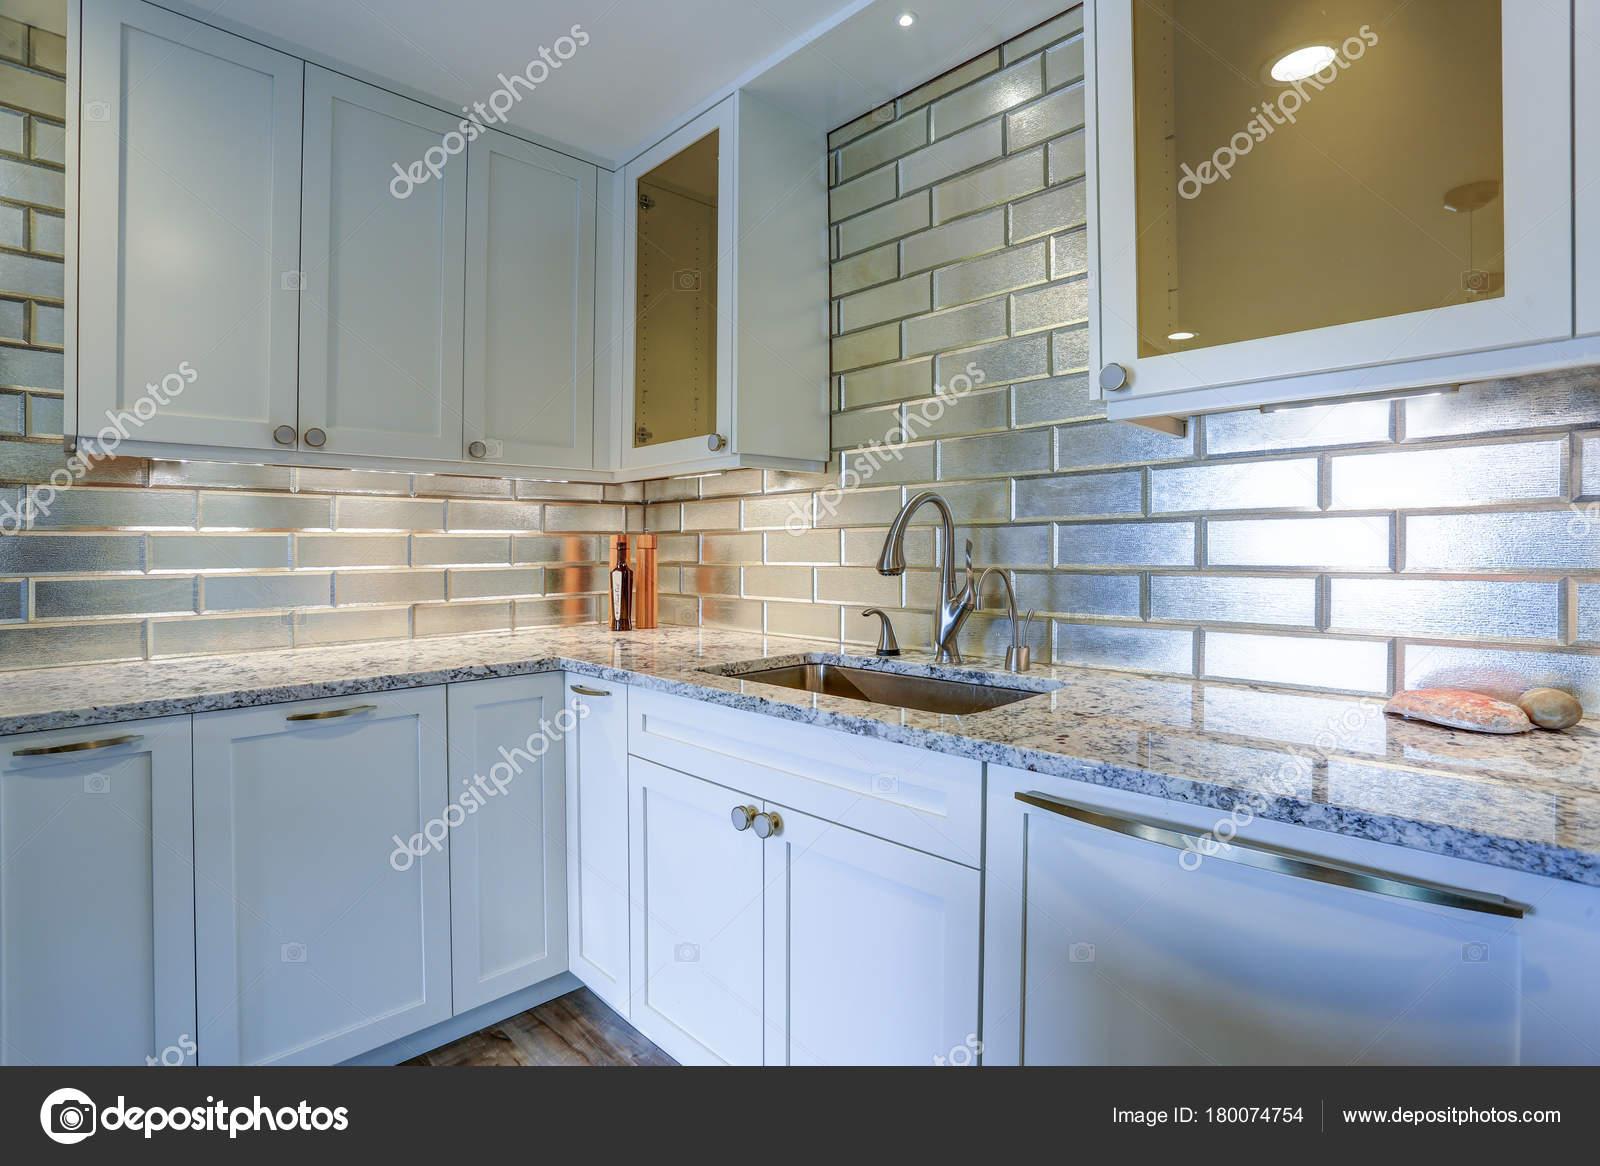 - Pictures : Quartzite Countertops Modern White Kitchen Design